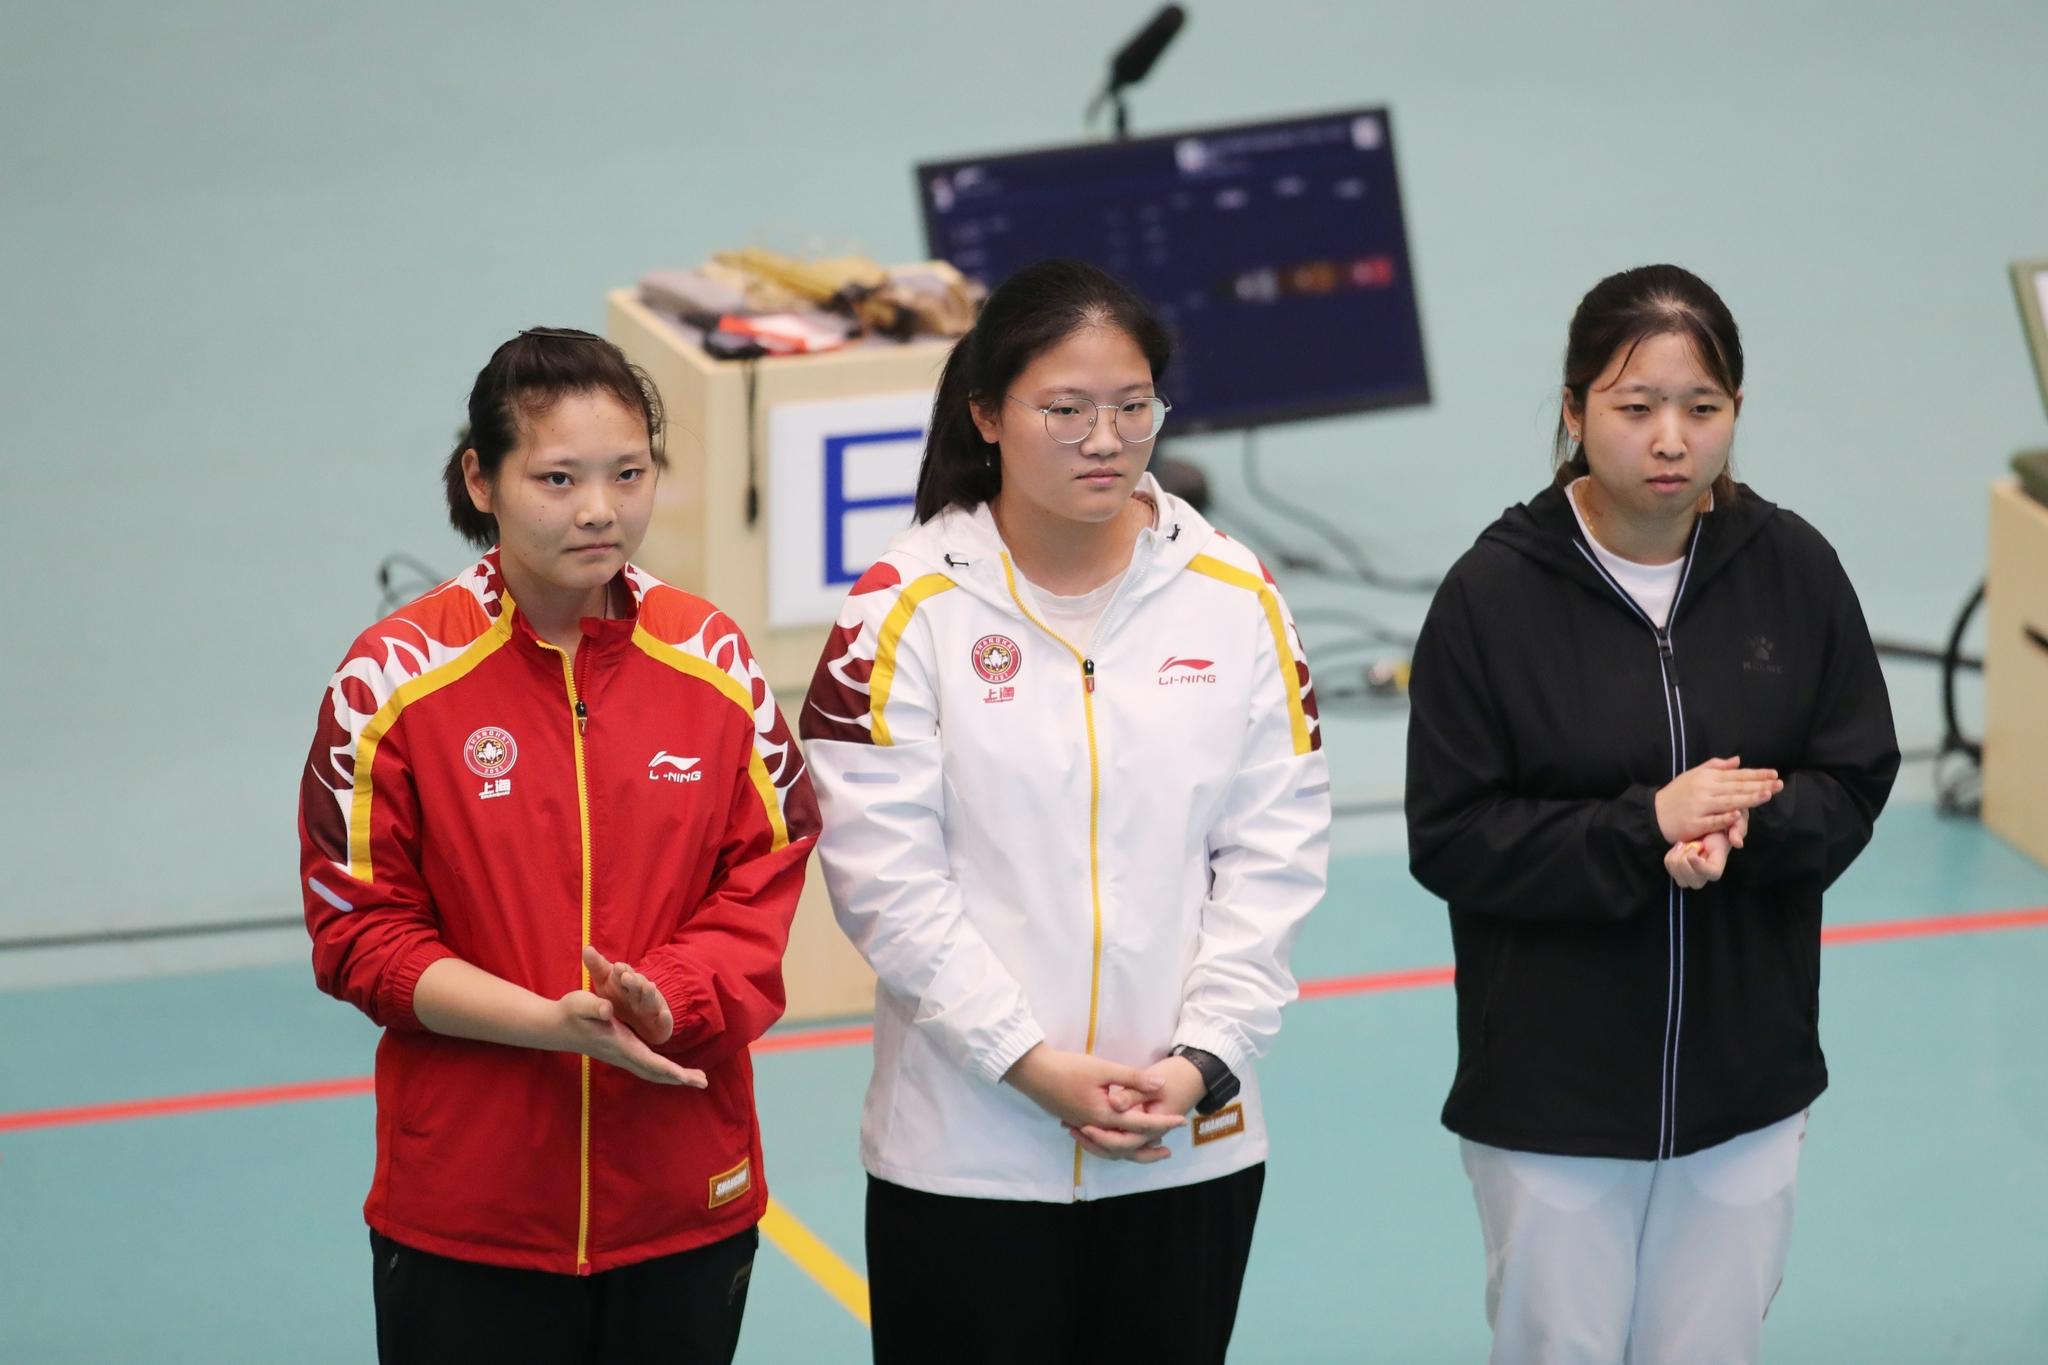 Shen Yiyao (middle) defeated Shanghai teammate and Olympic champion Jiang Ranxin.